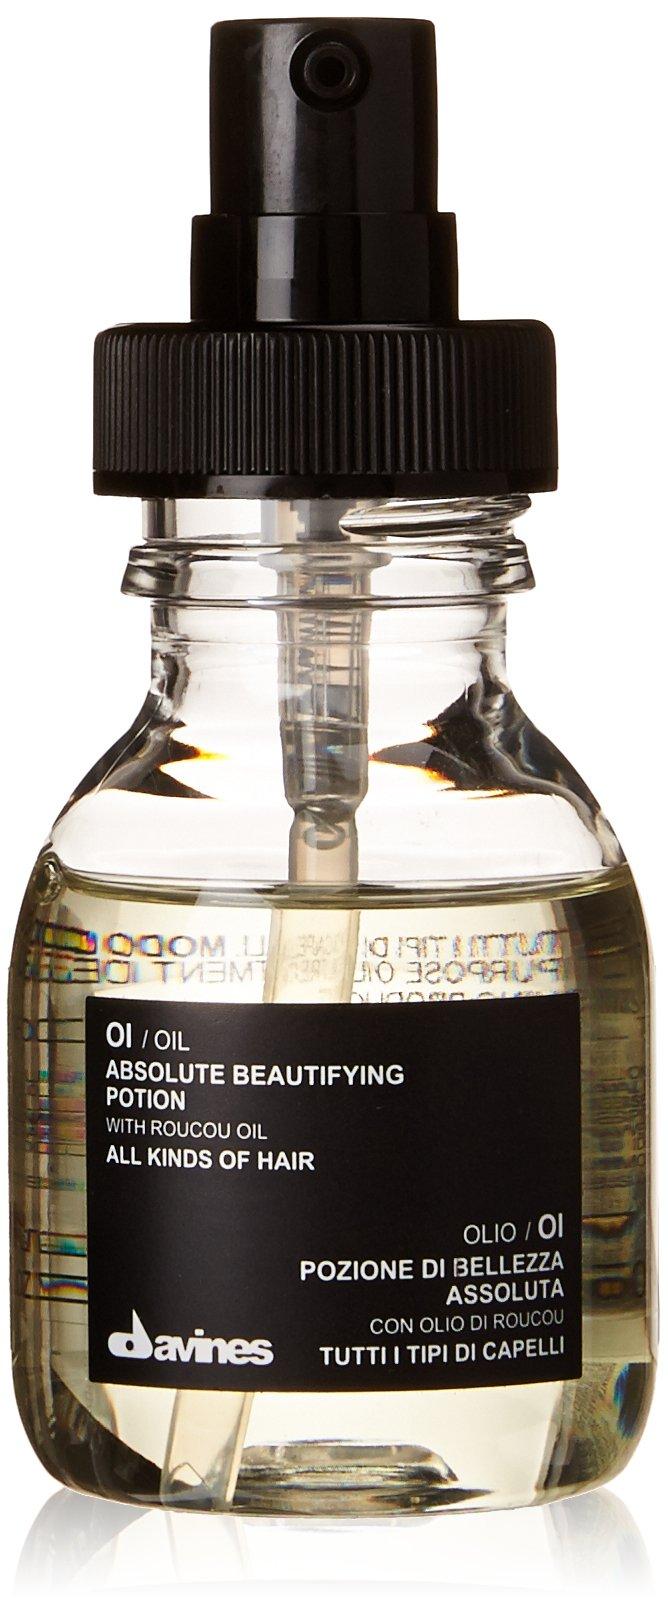 Davines OI Oil Travel Size, 1.69 fl. oz.